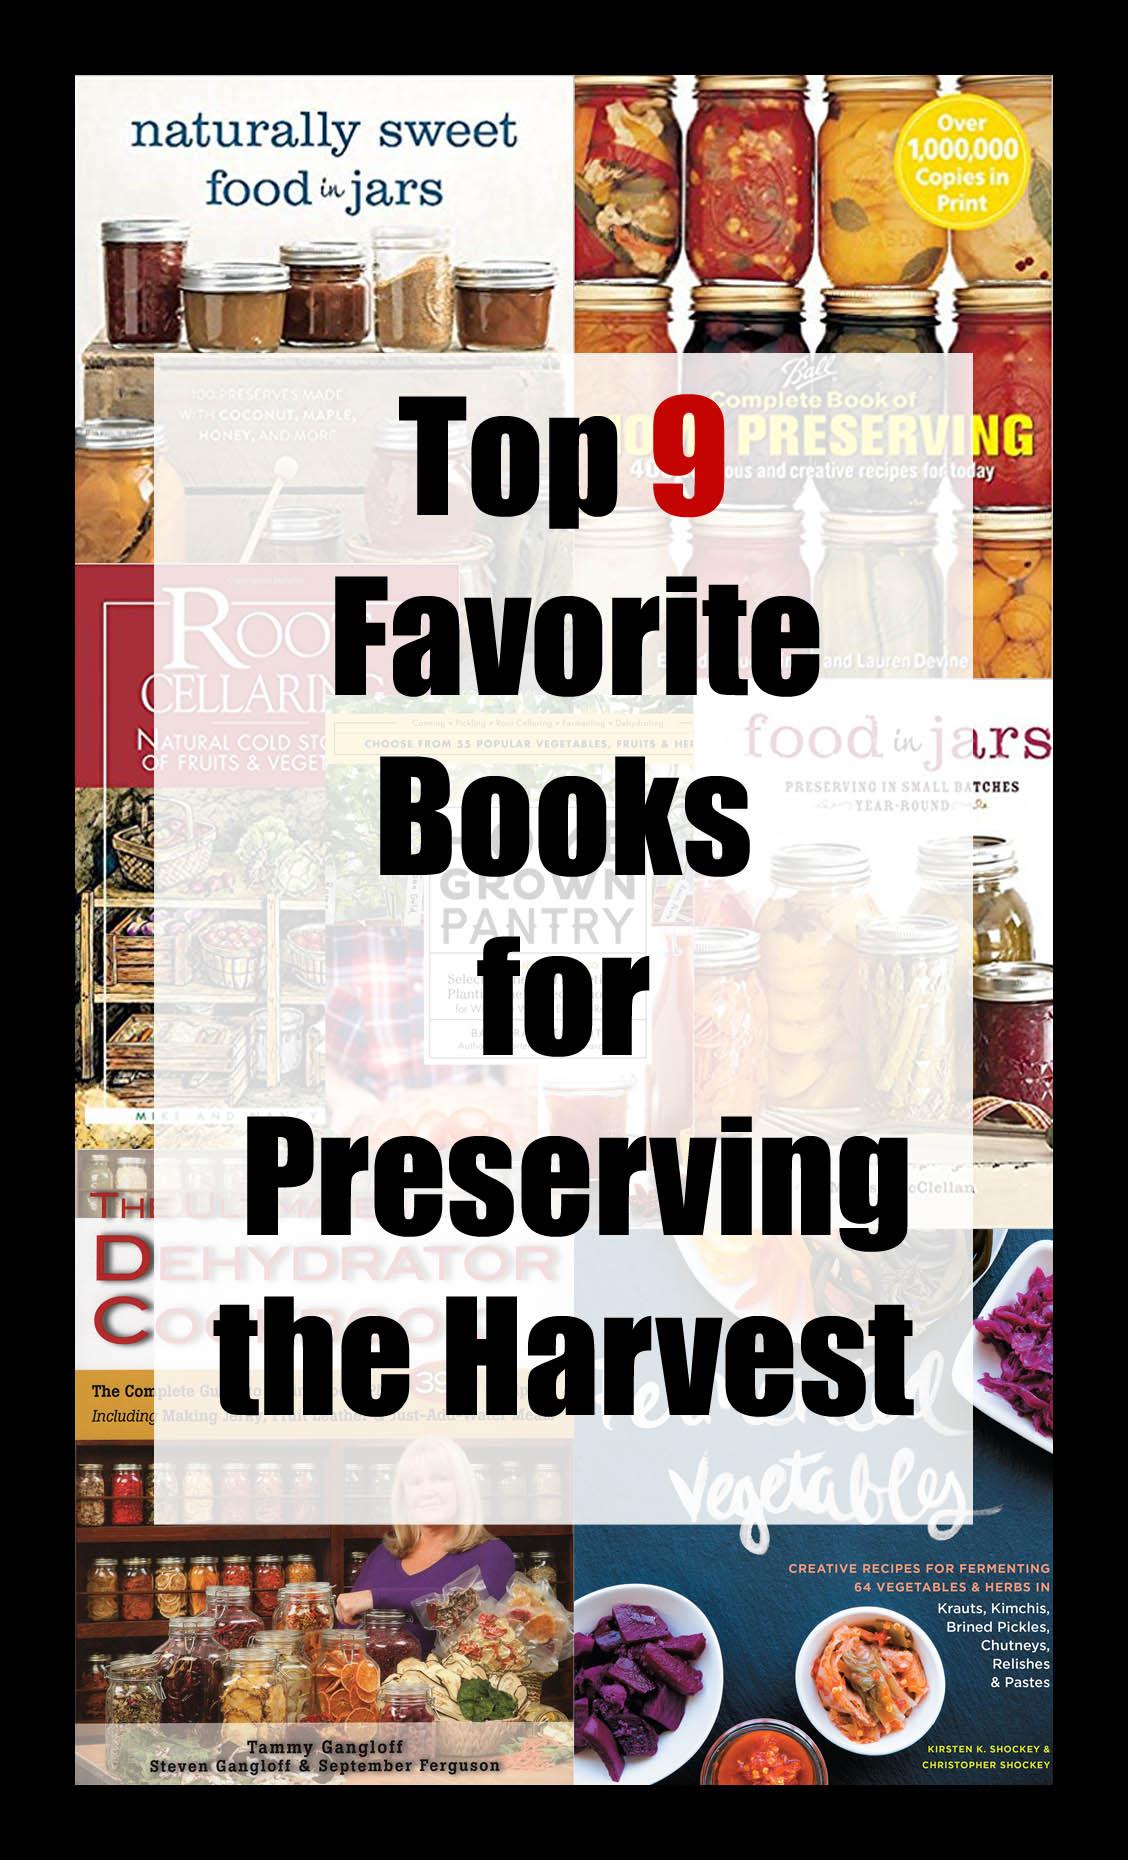 Top 9 Favorite Books for Preserving the Harvest.jpg